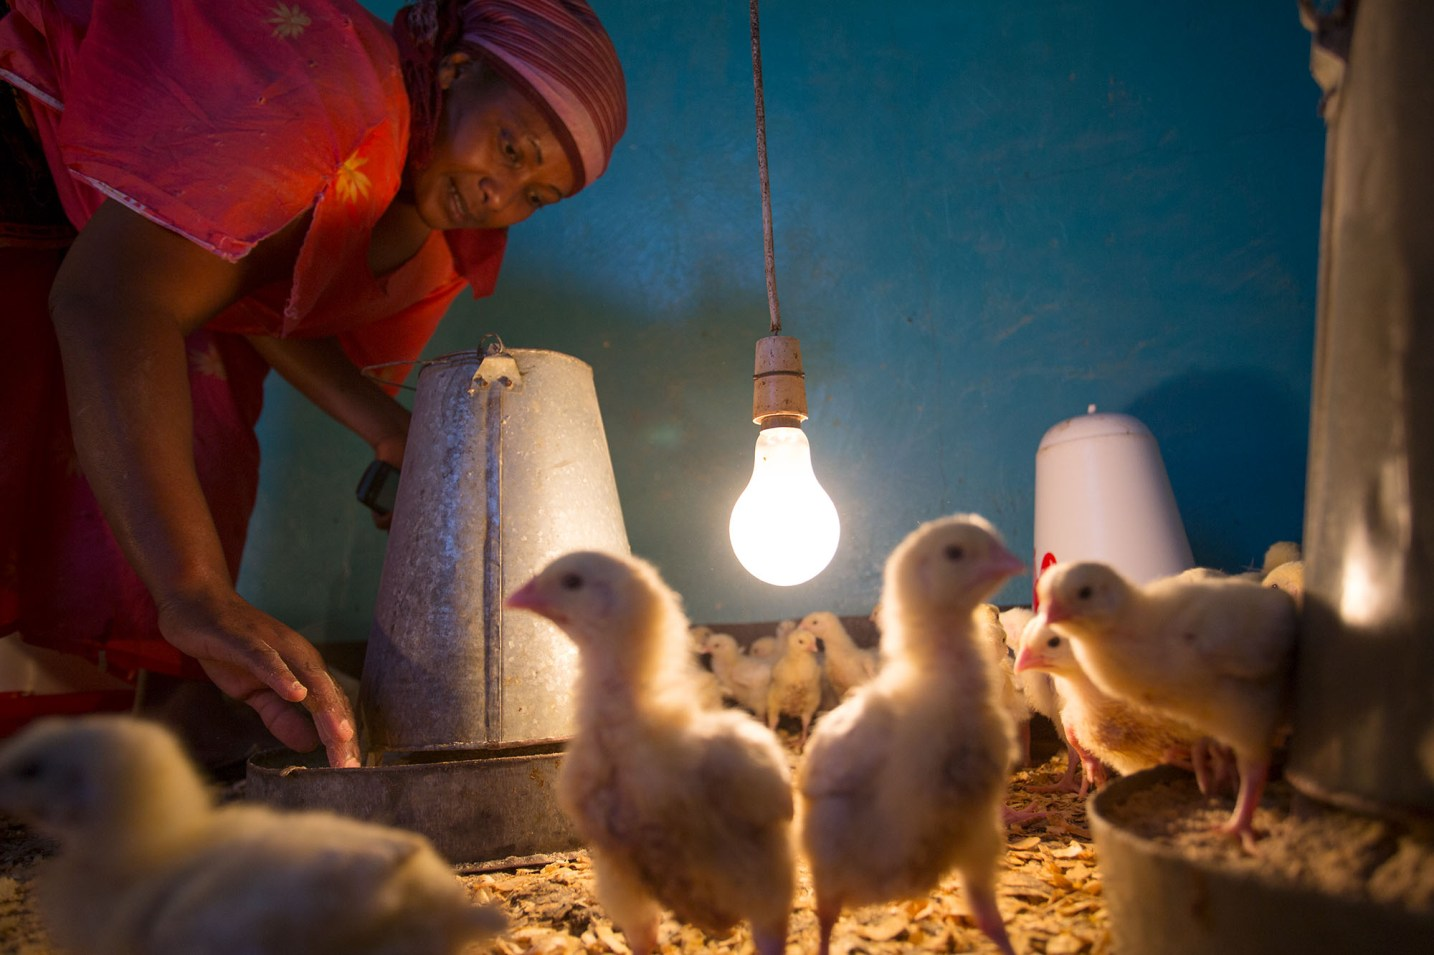 A woman raises chickens in Arusha, Tanzania.